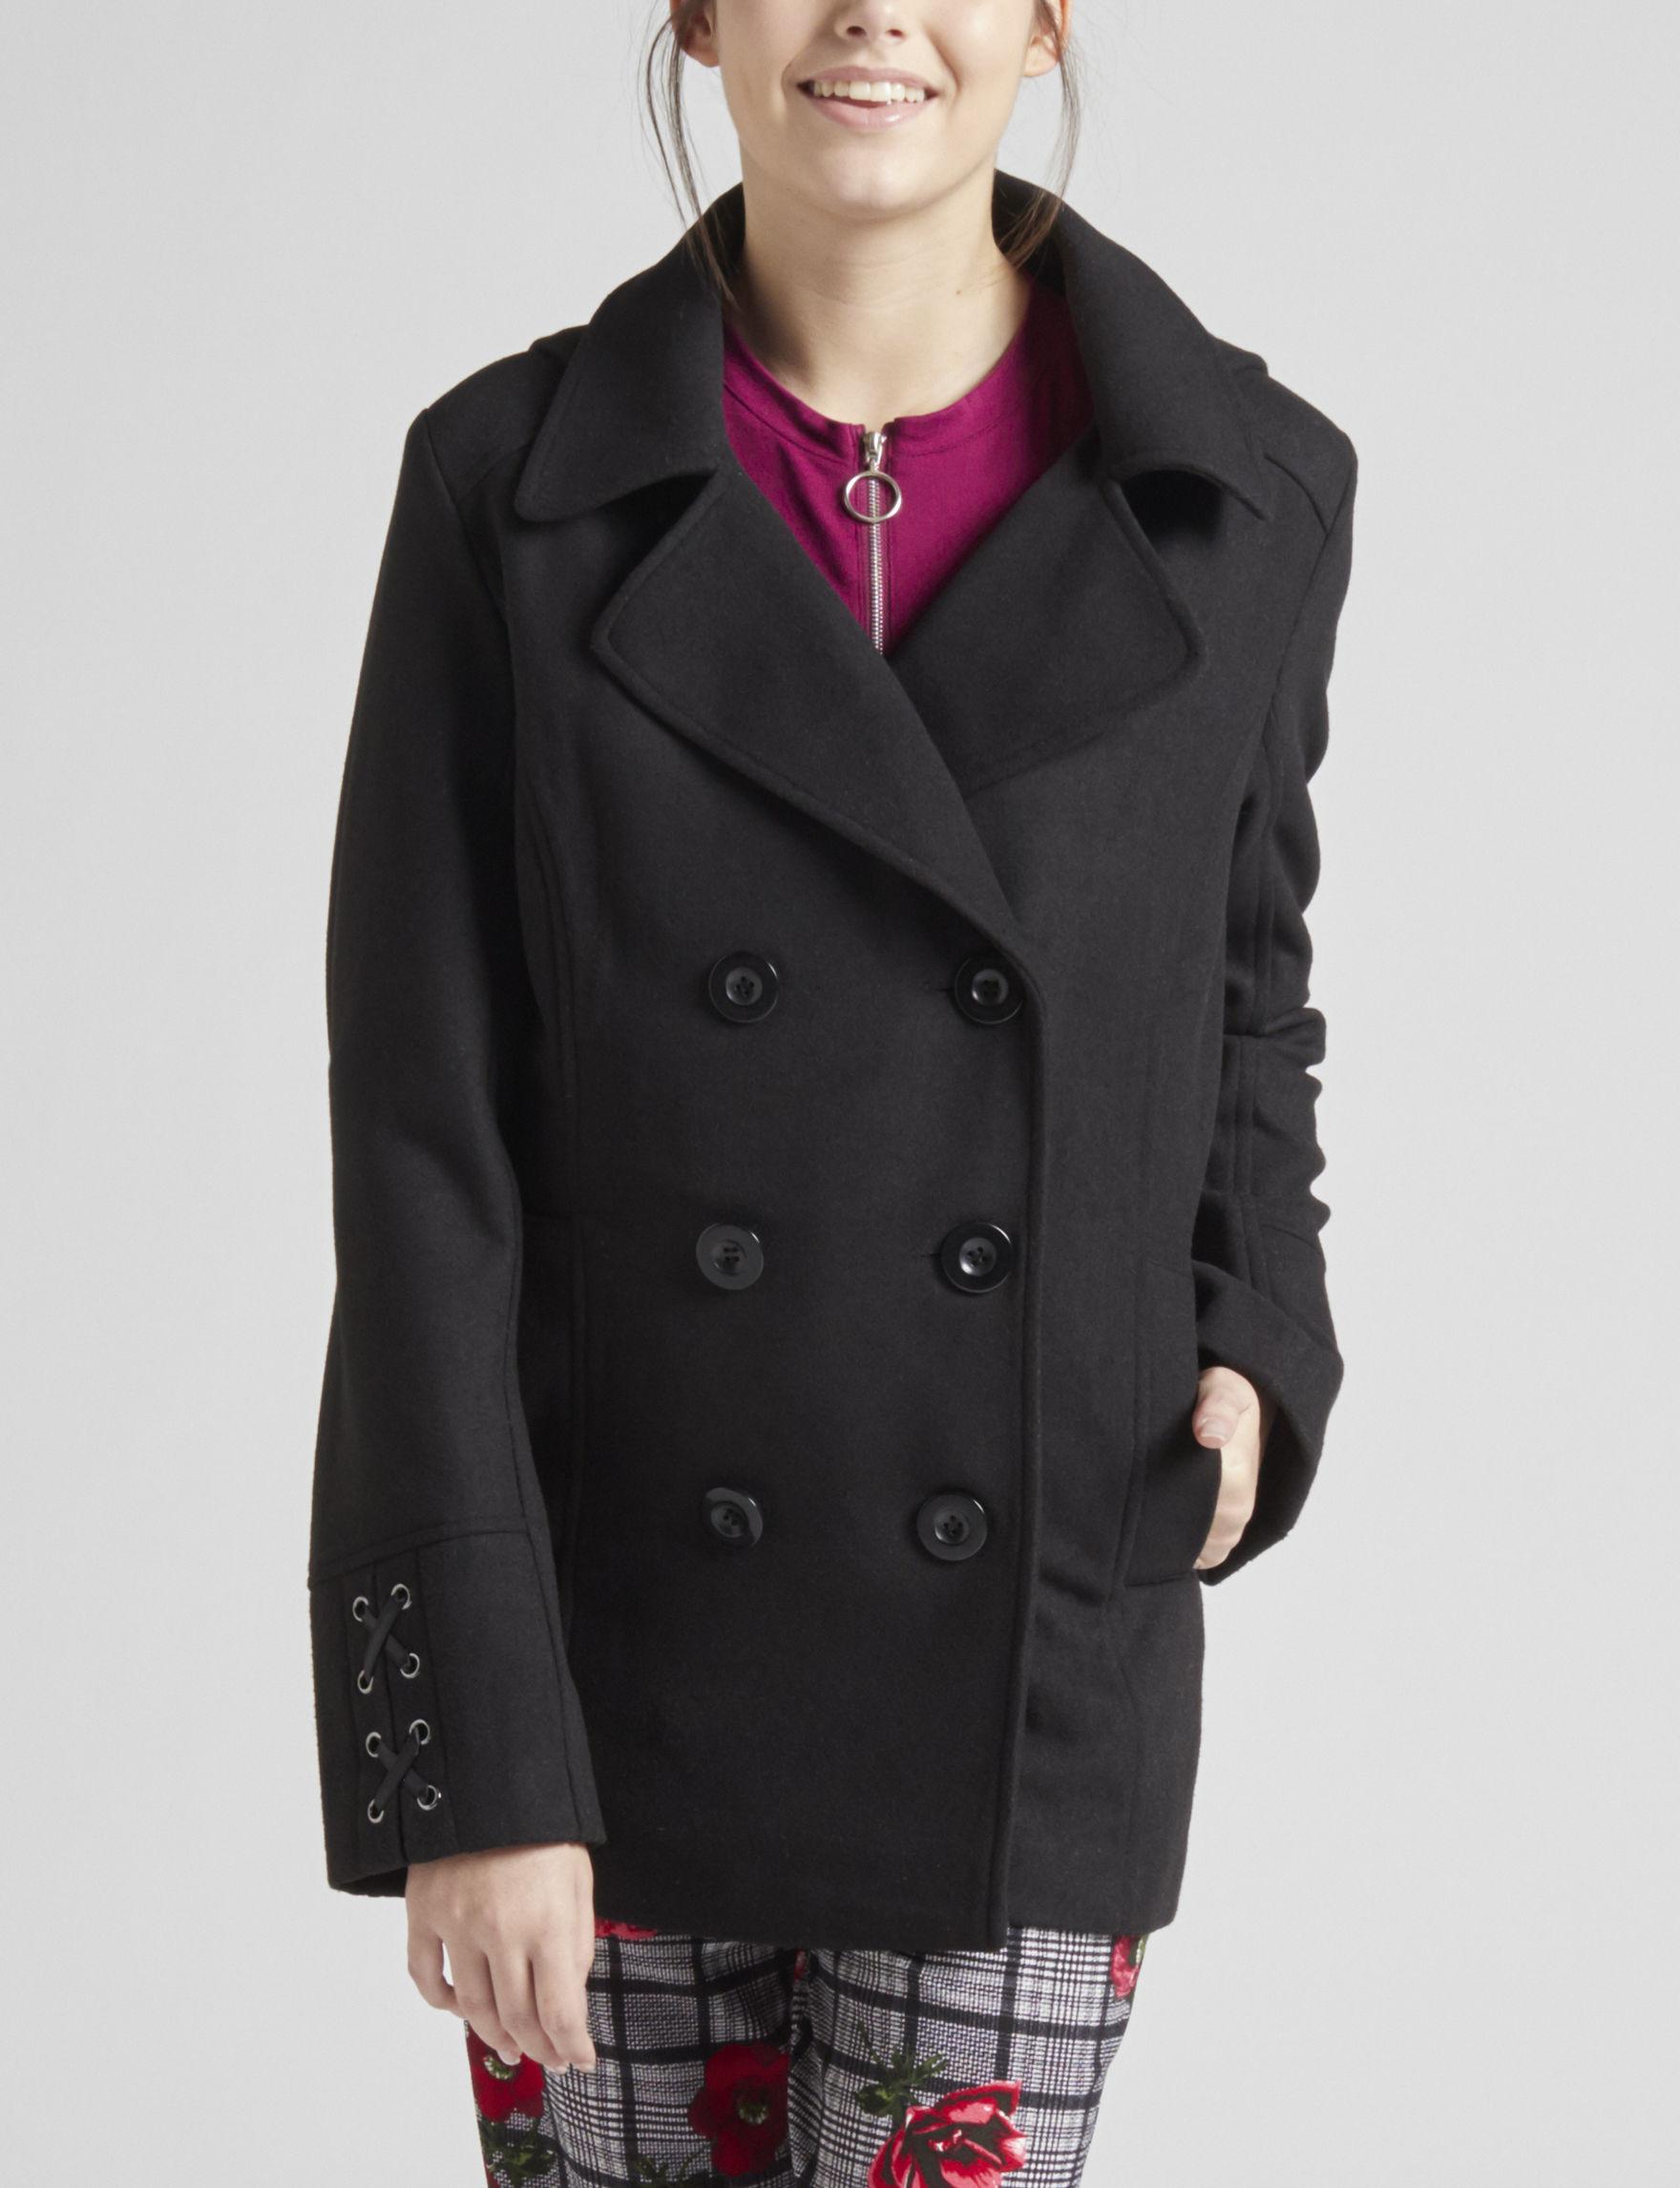 Rampage Black Peacoats & Overcoats